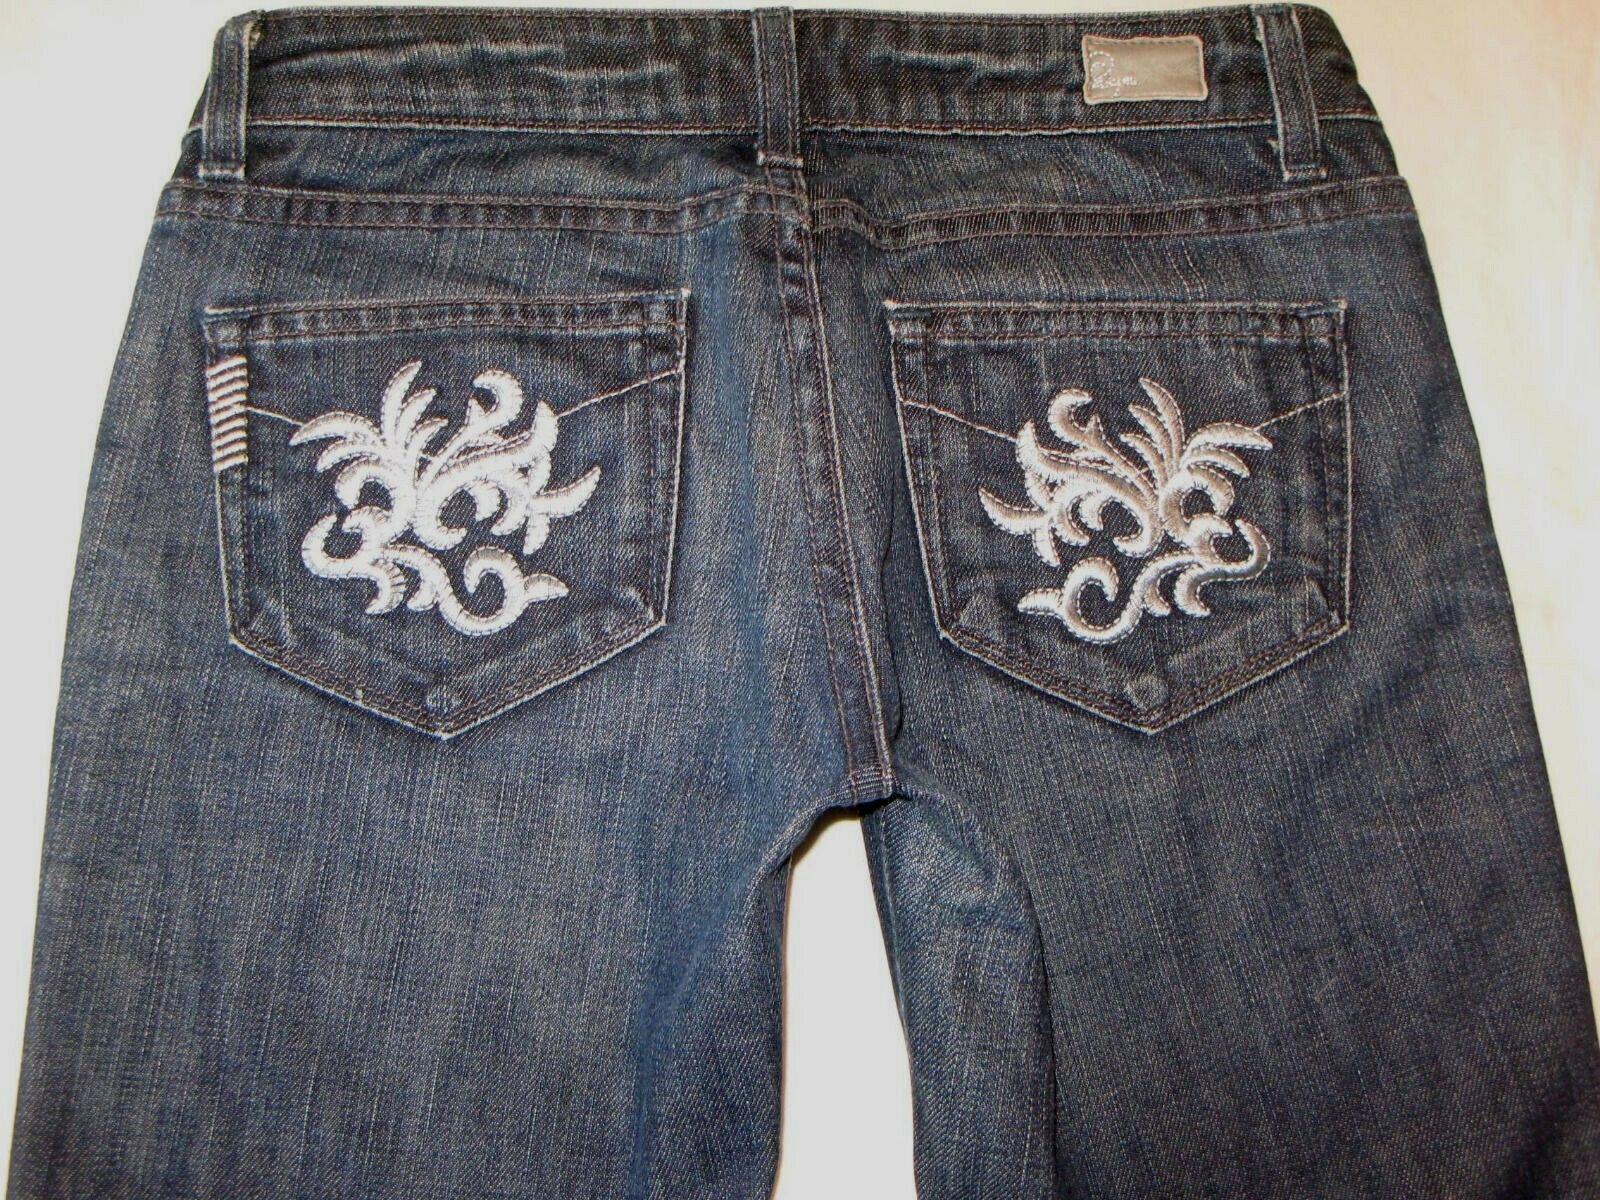 Paige Laurel Canyon Low Bootcut Jeans Sz 26 Dark Distressed w Stretch L 28